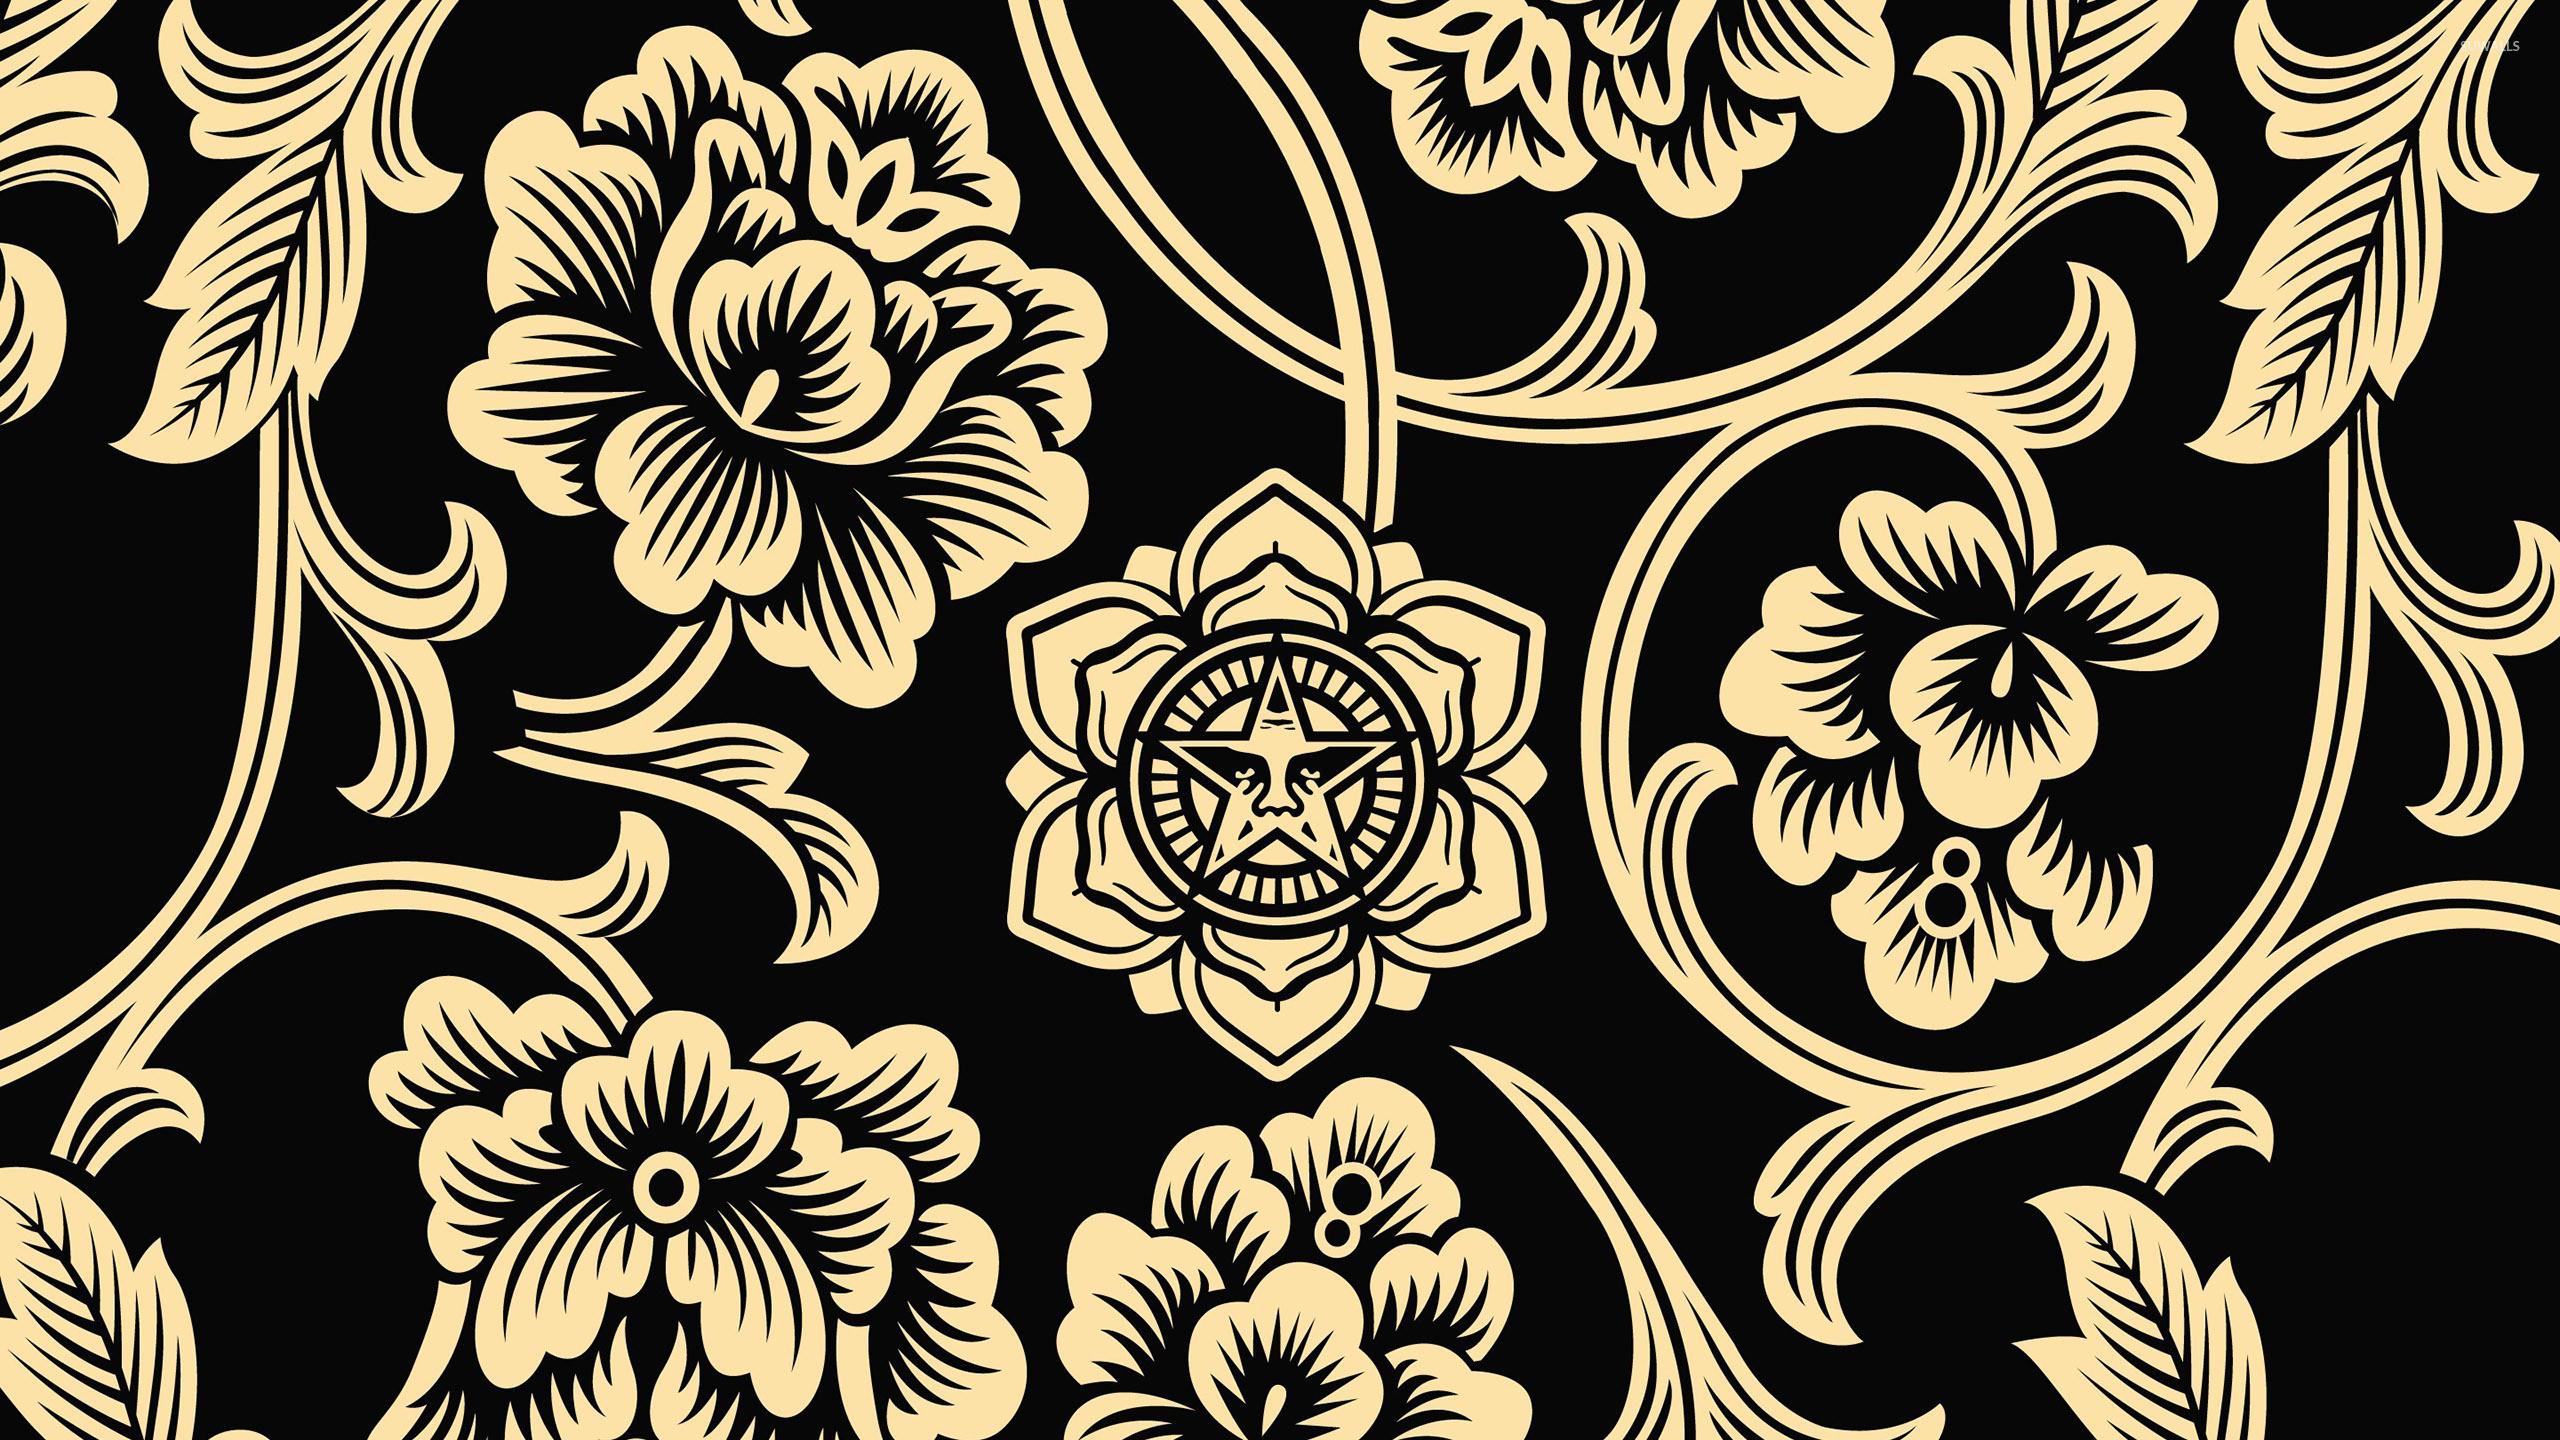 Res: 2560x1440, Tribal golden flowers on dark background wallpaper